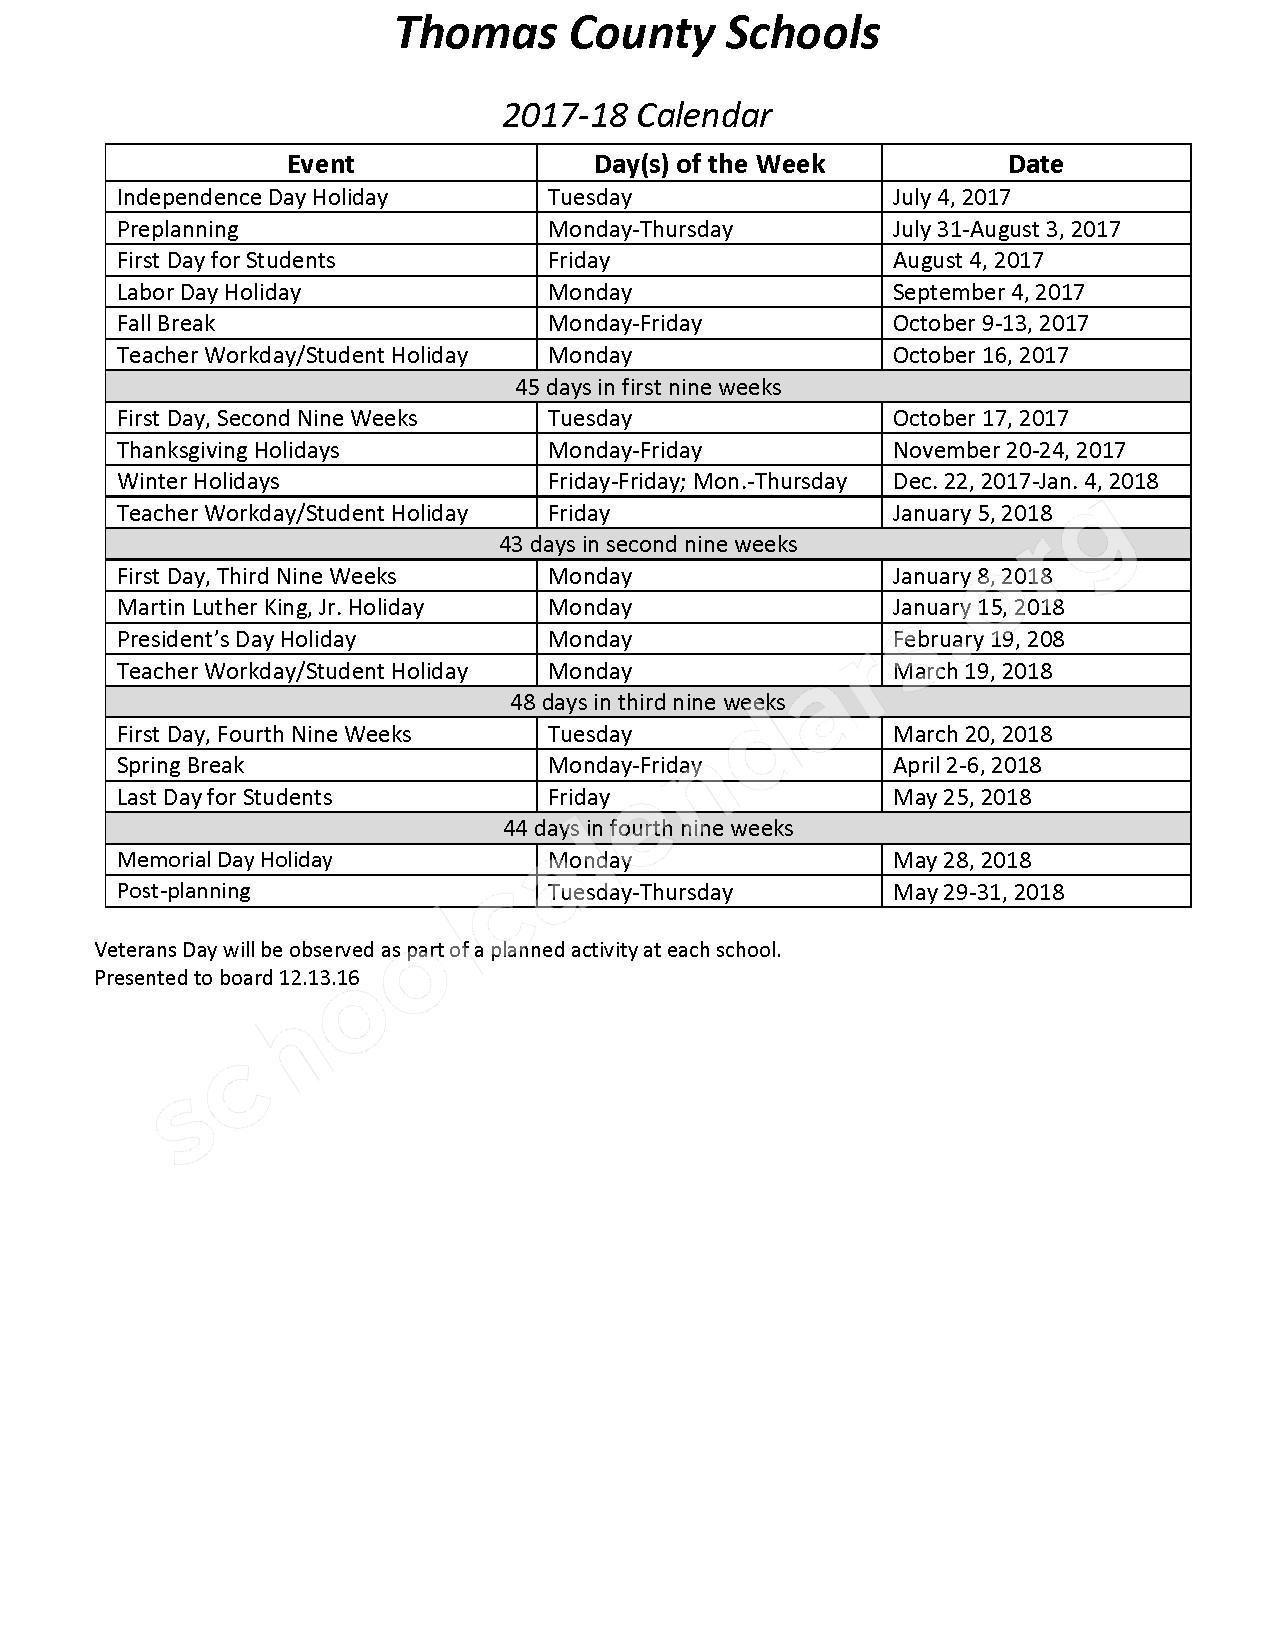 School Year Calendar, 2017 - 2018 – Thomas County School District – page 1